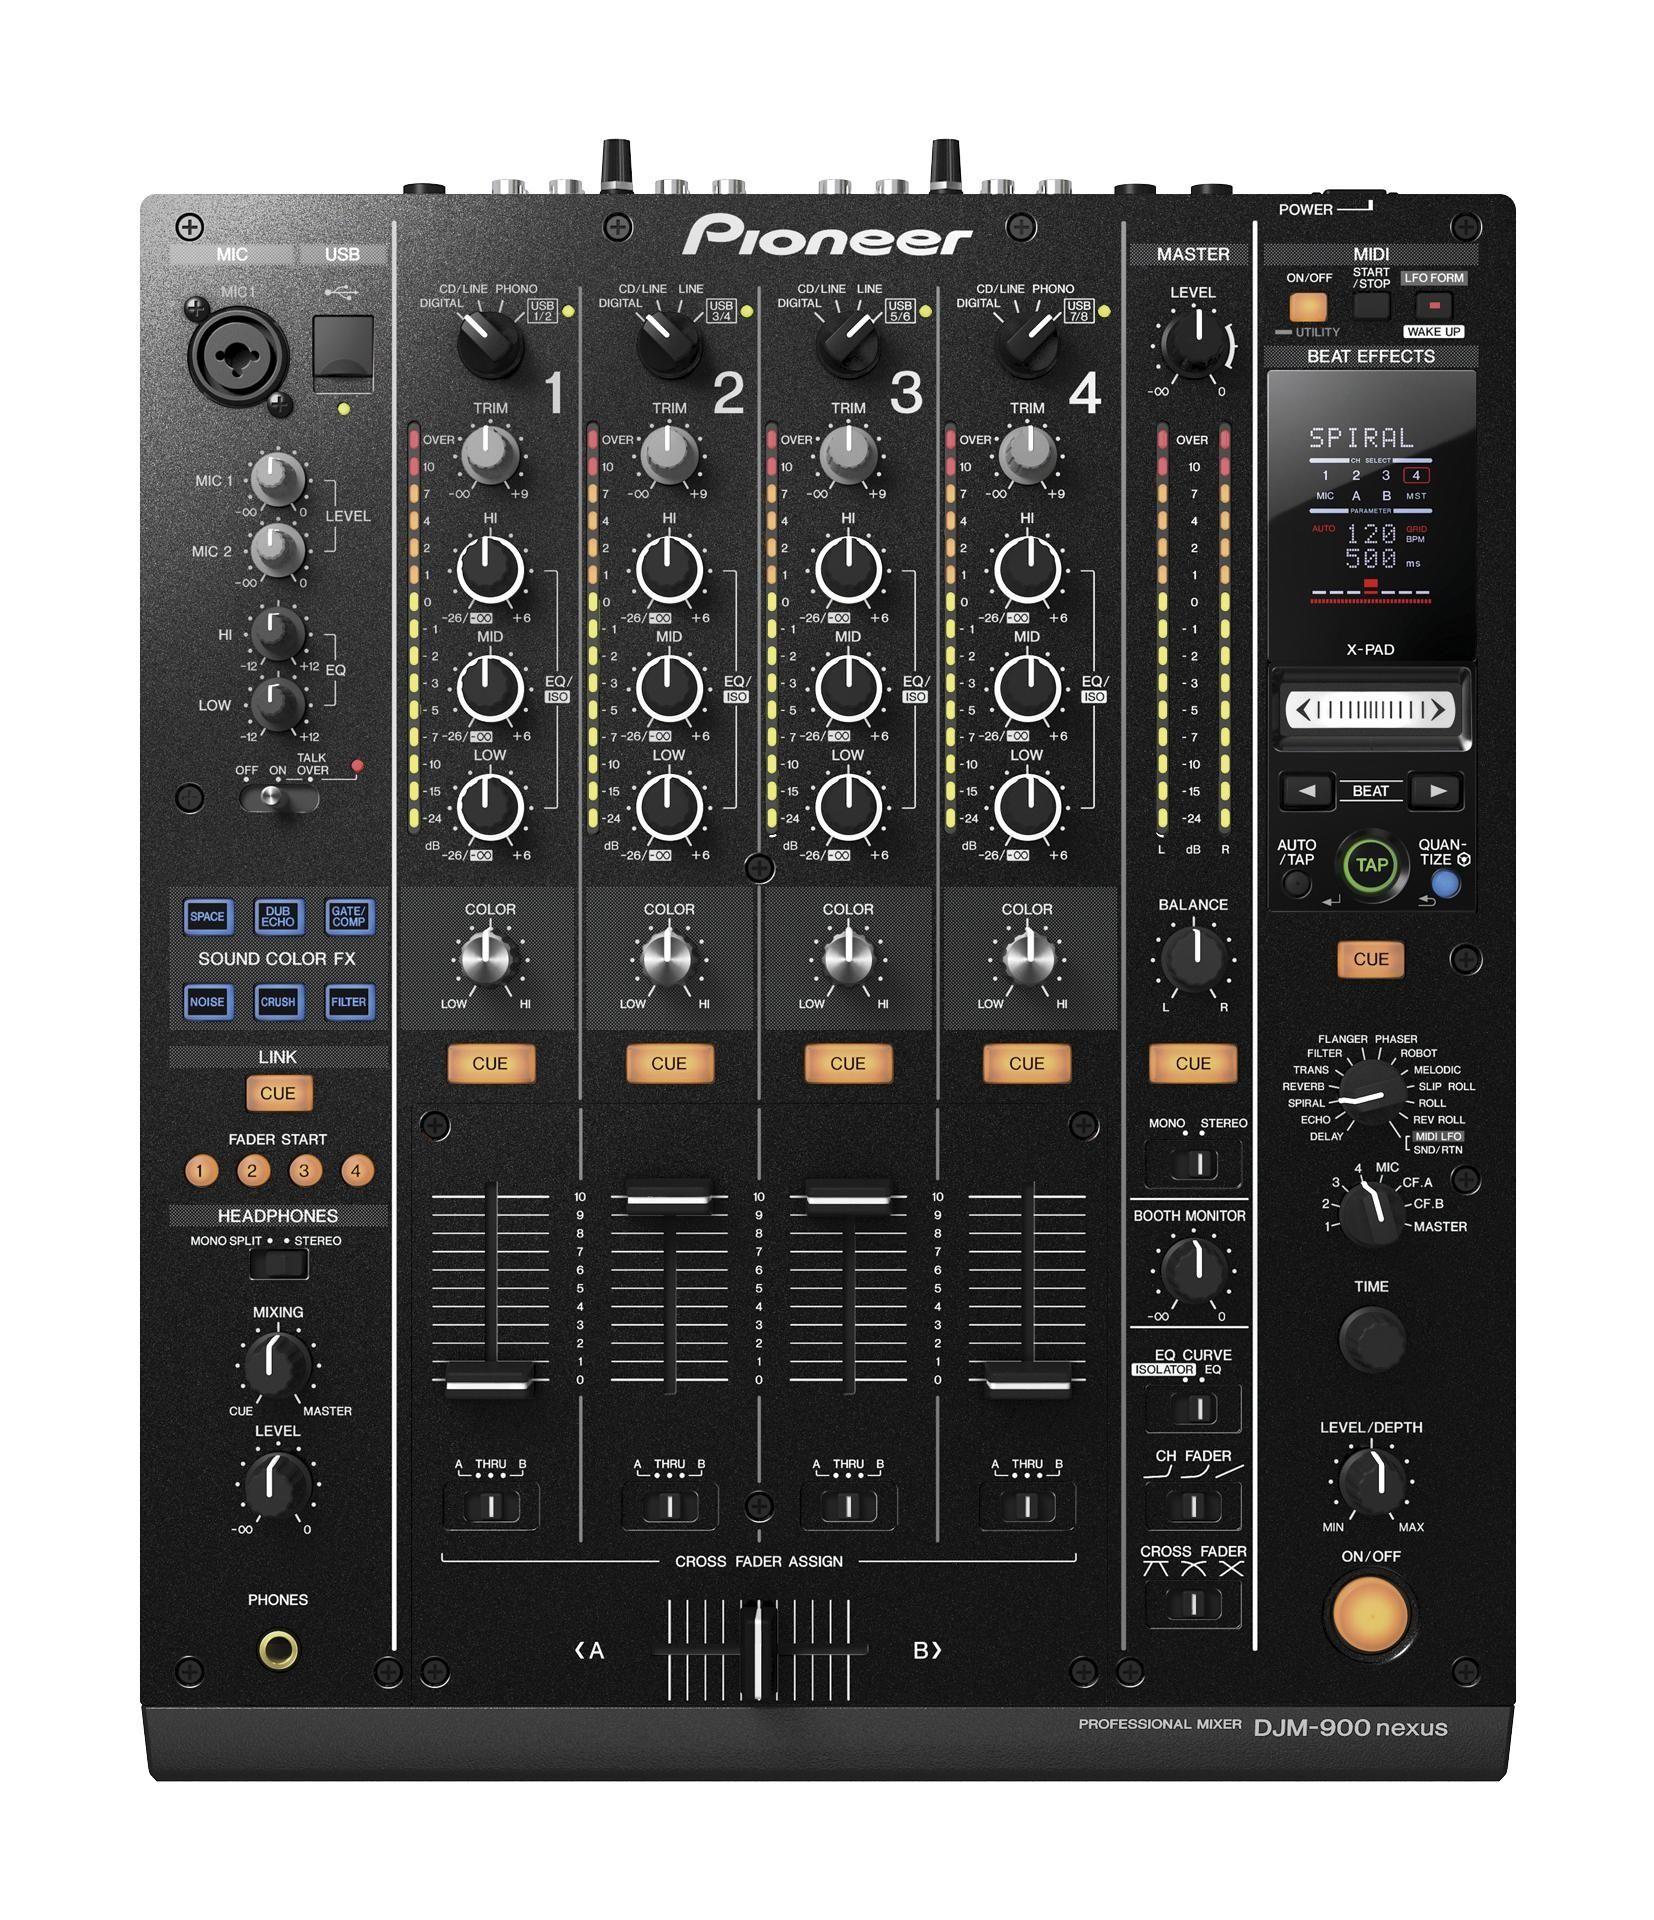 Pioneer Djm 900 Nexus Mixer Dream Music Set Up Dj Gear